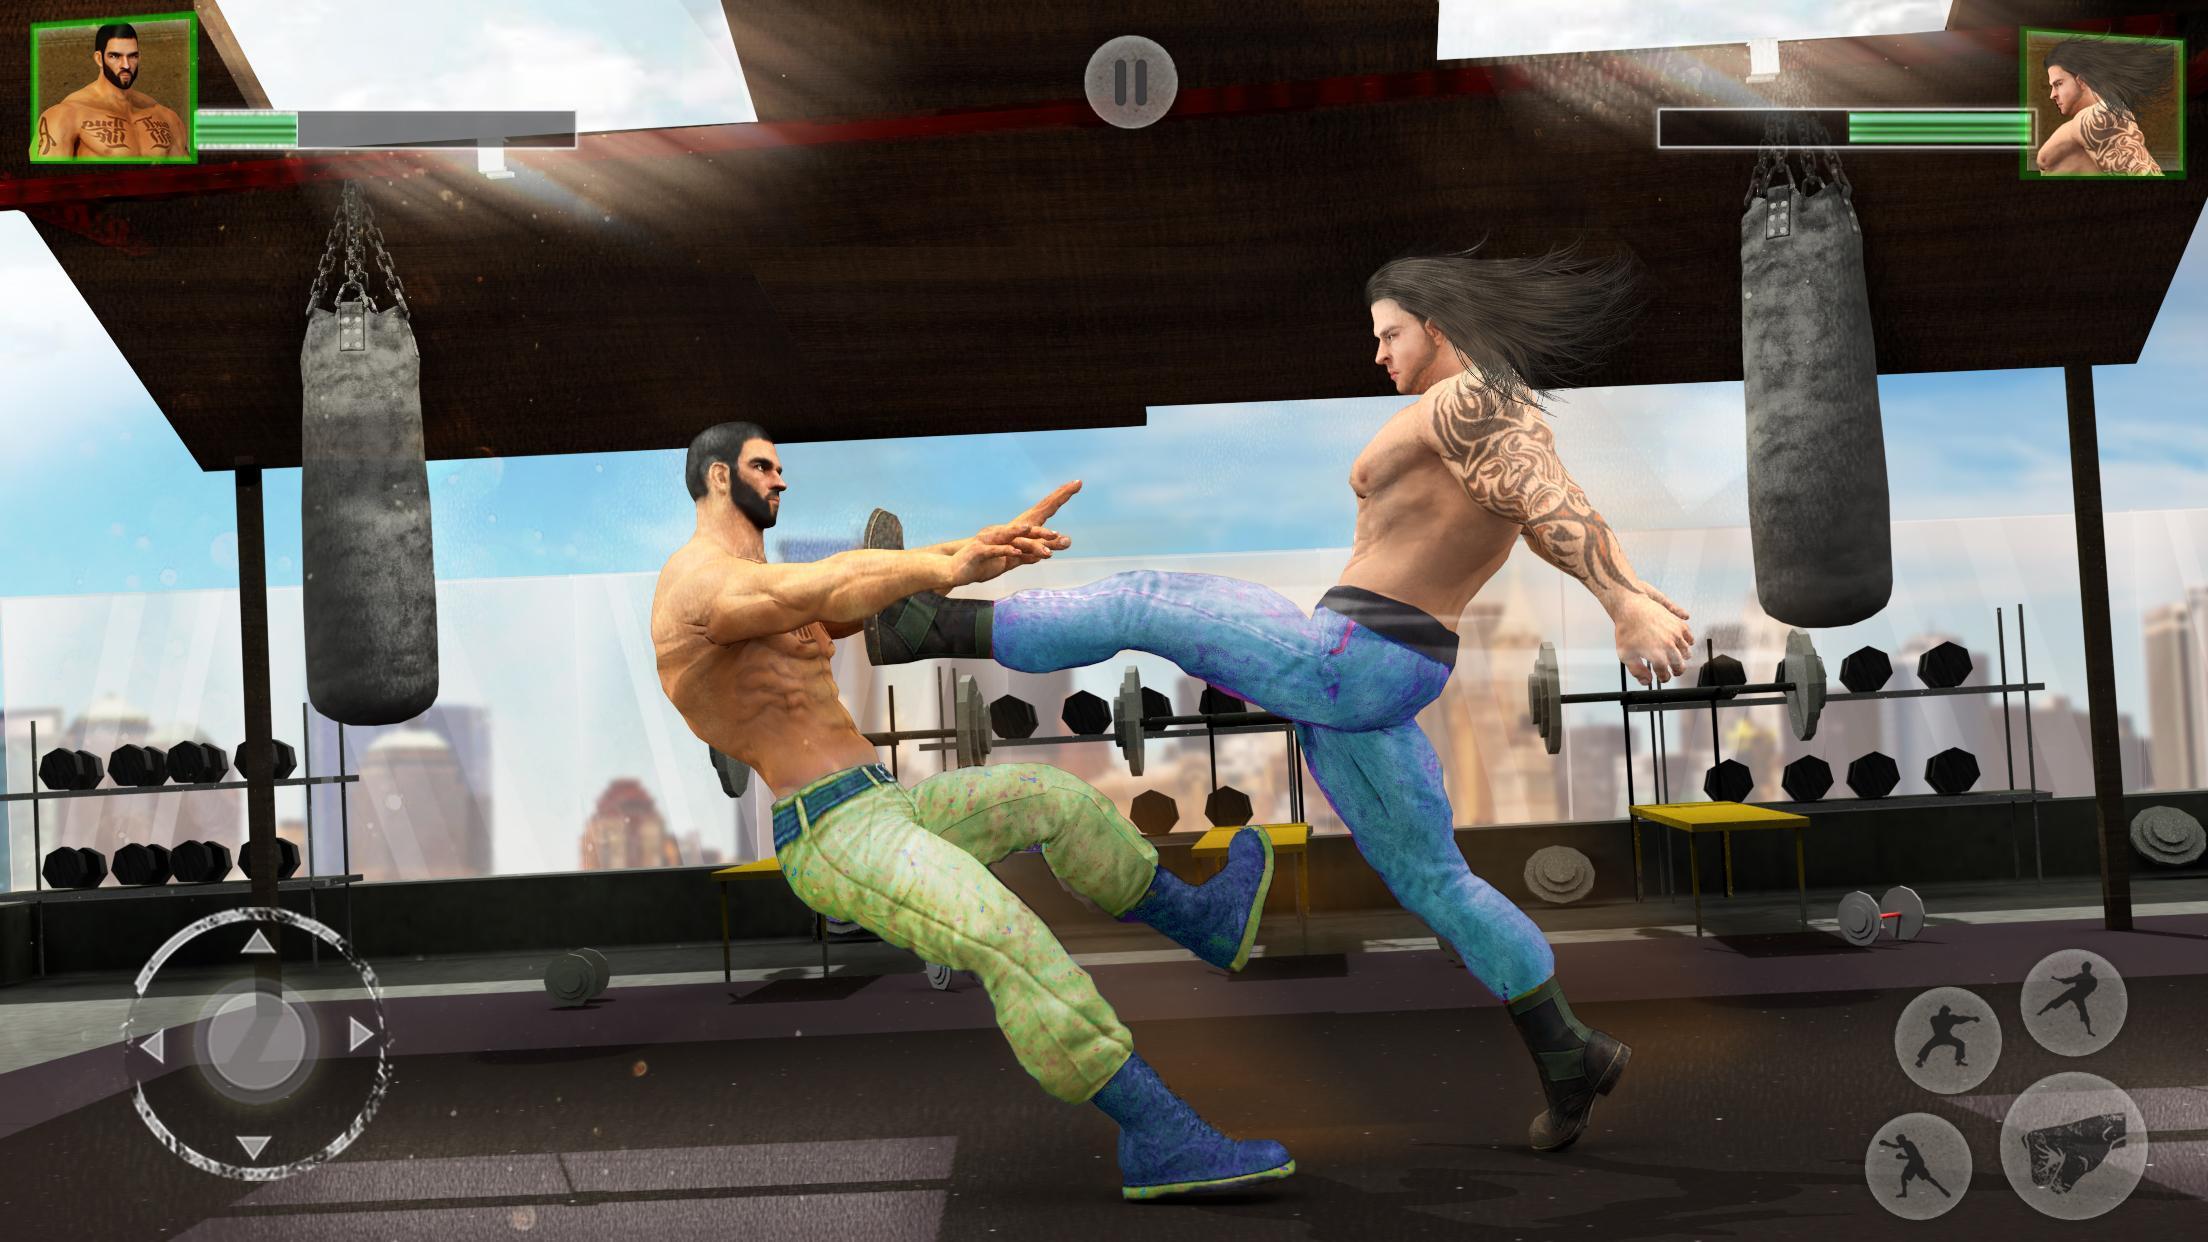 Bodybuilder Fighting Club 2019: Wrestling Games 1.1.4 Screenshot 1